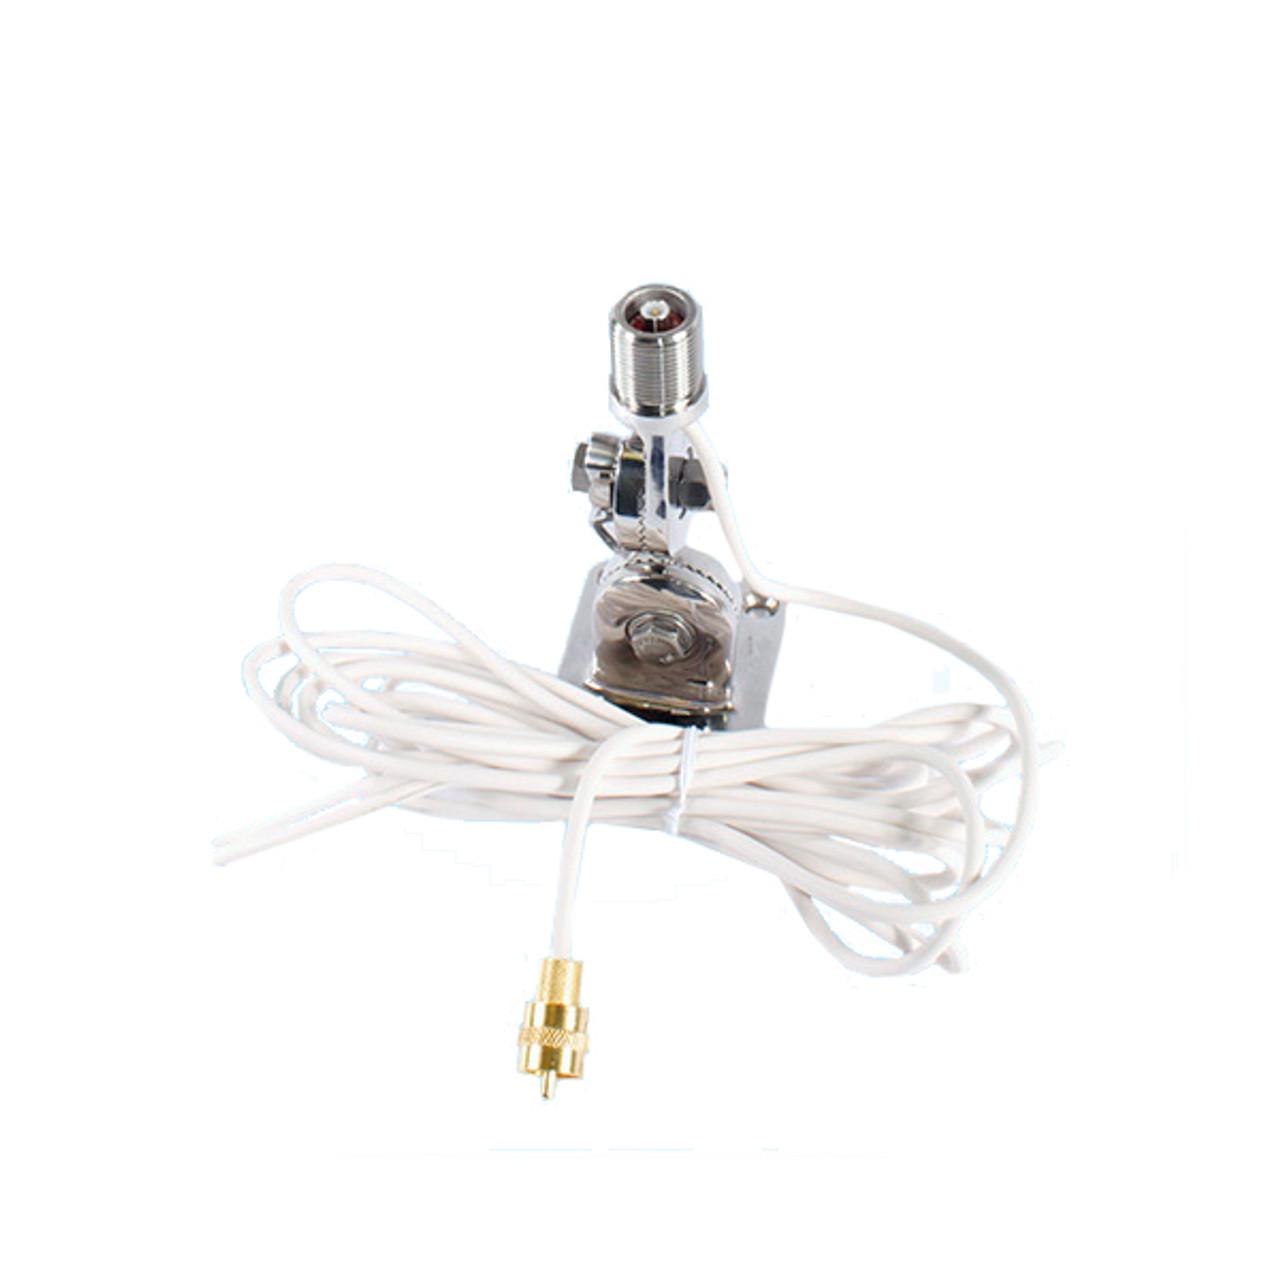 Shakespeare Antenna Mount VHF Radio Marine Stainless Steel Ratchet New